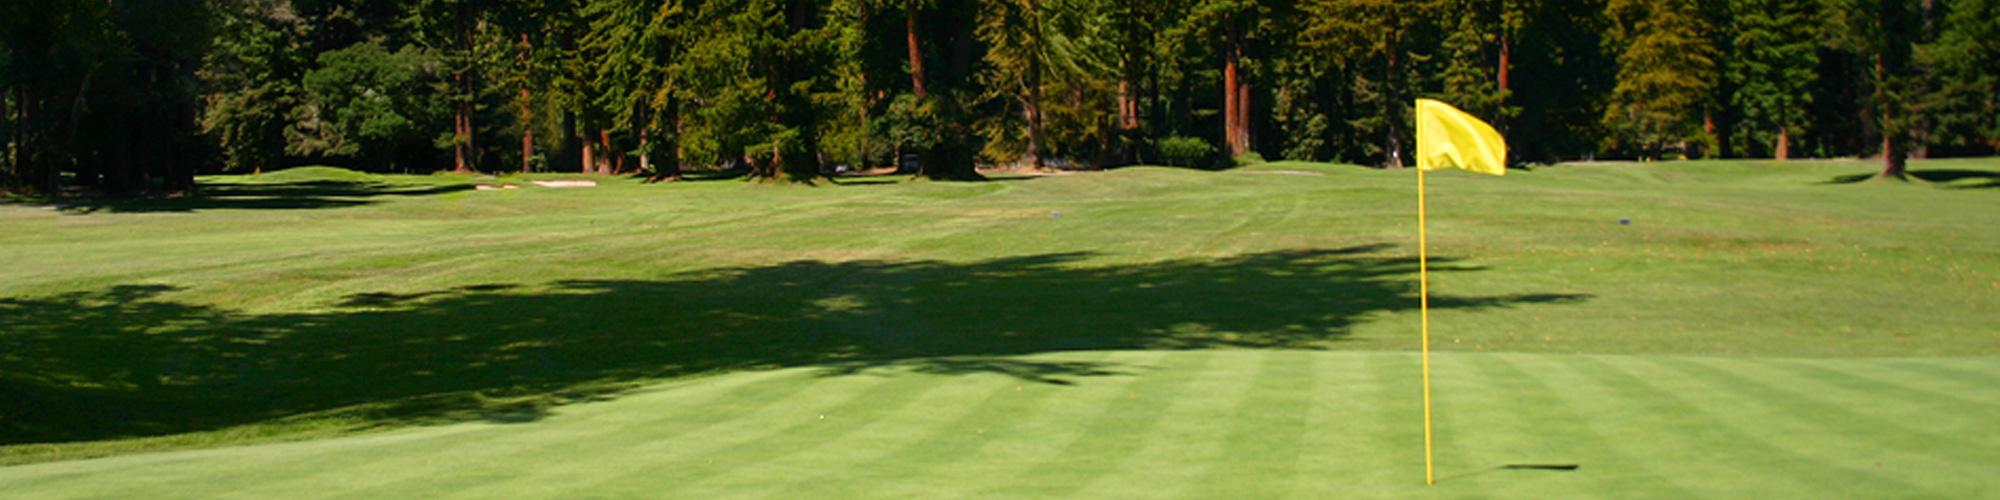 Golf Memberships Golf Club Membership Country Club Membership Public Golf Course Near Monte Rio Santa Rosa Sebastopol Windsor Ca Northwood Golf Club